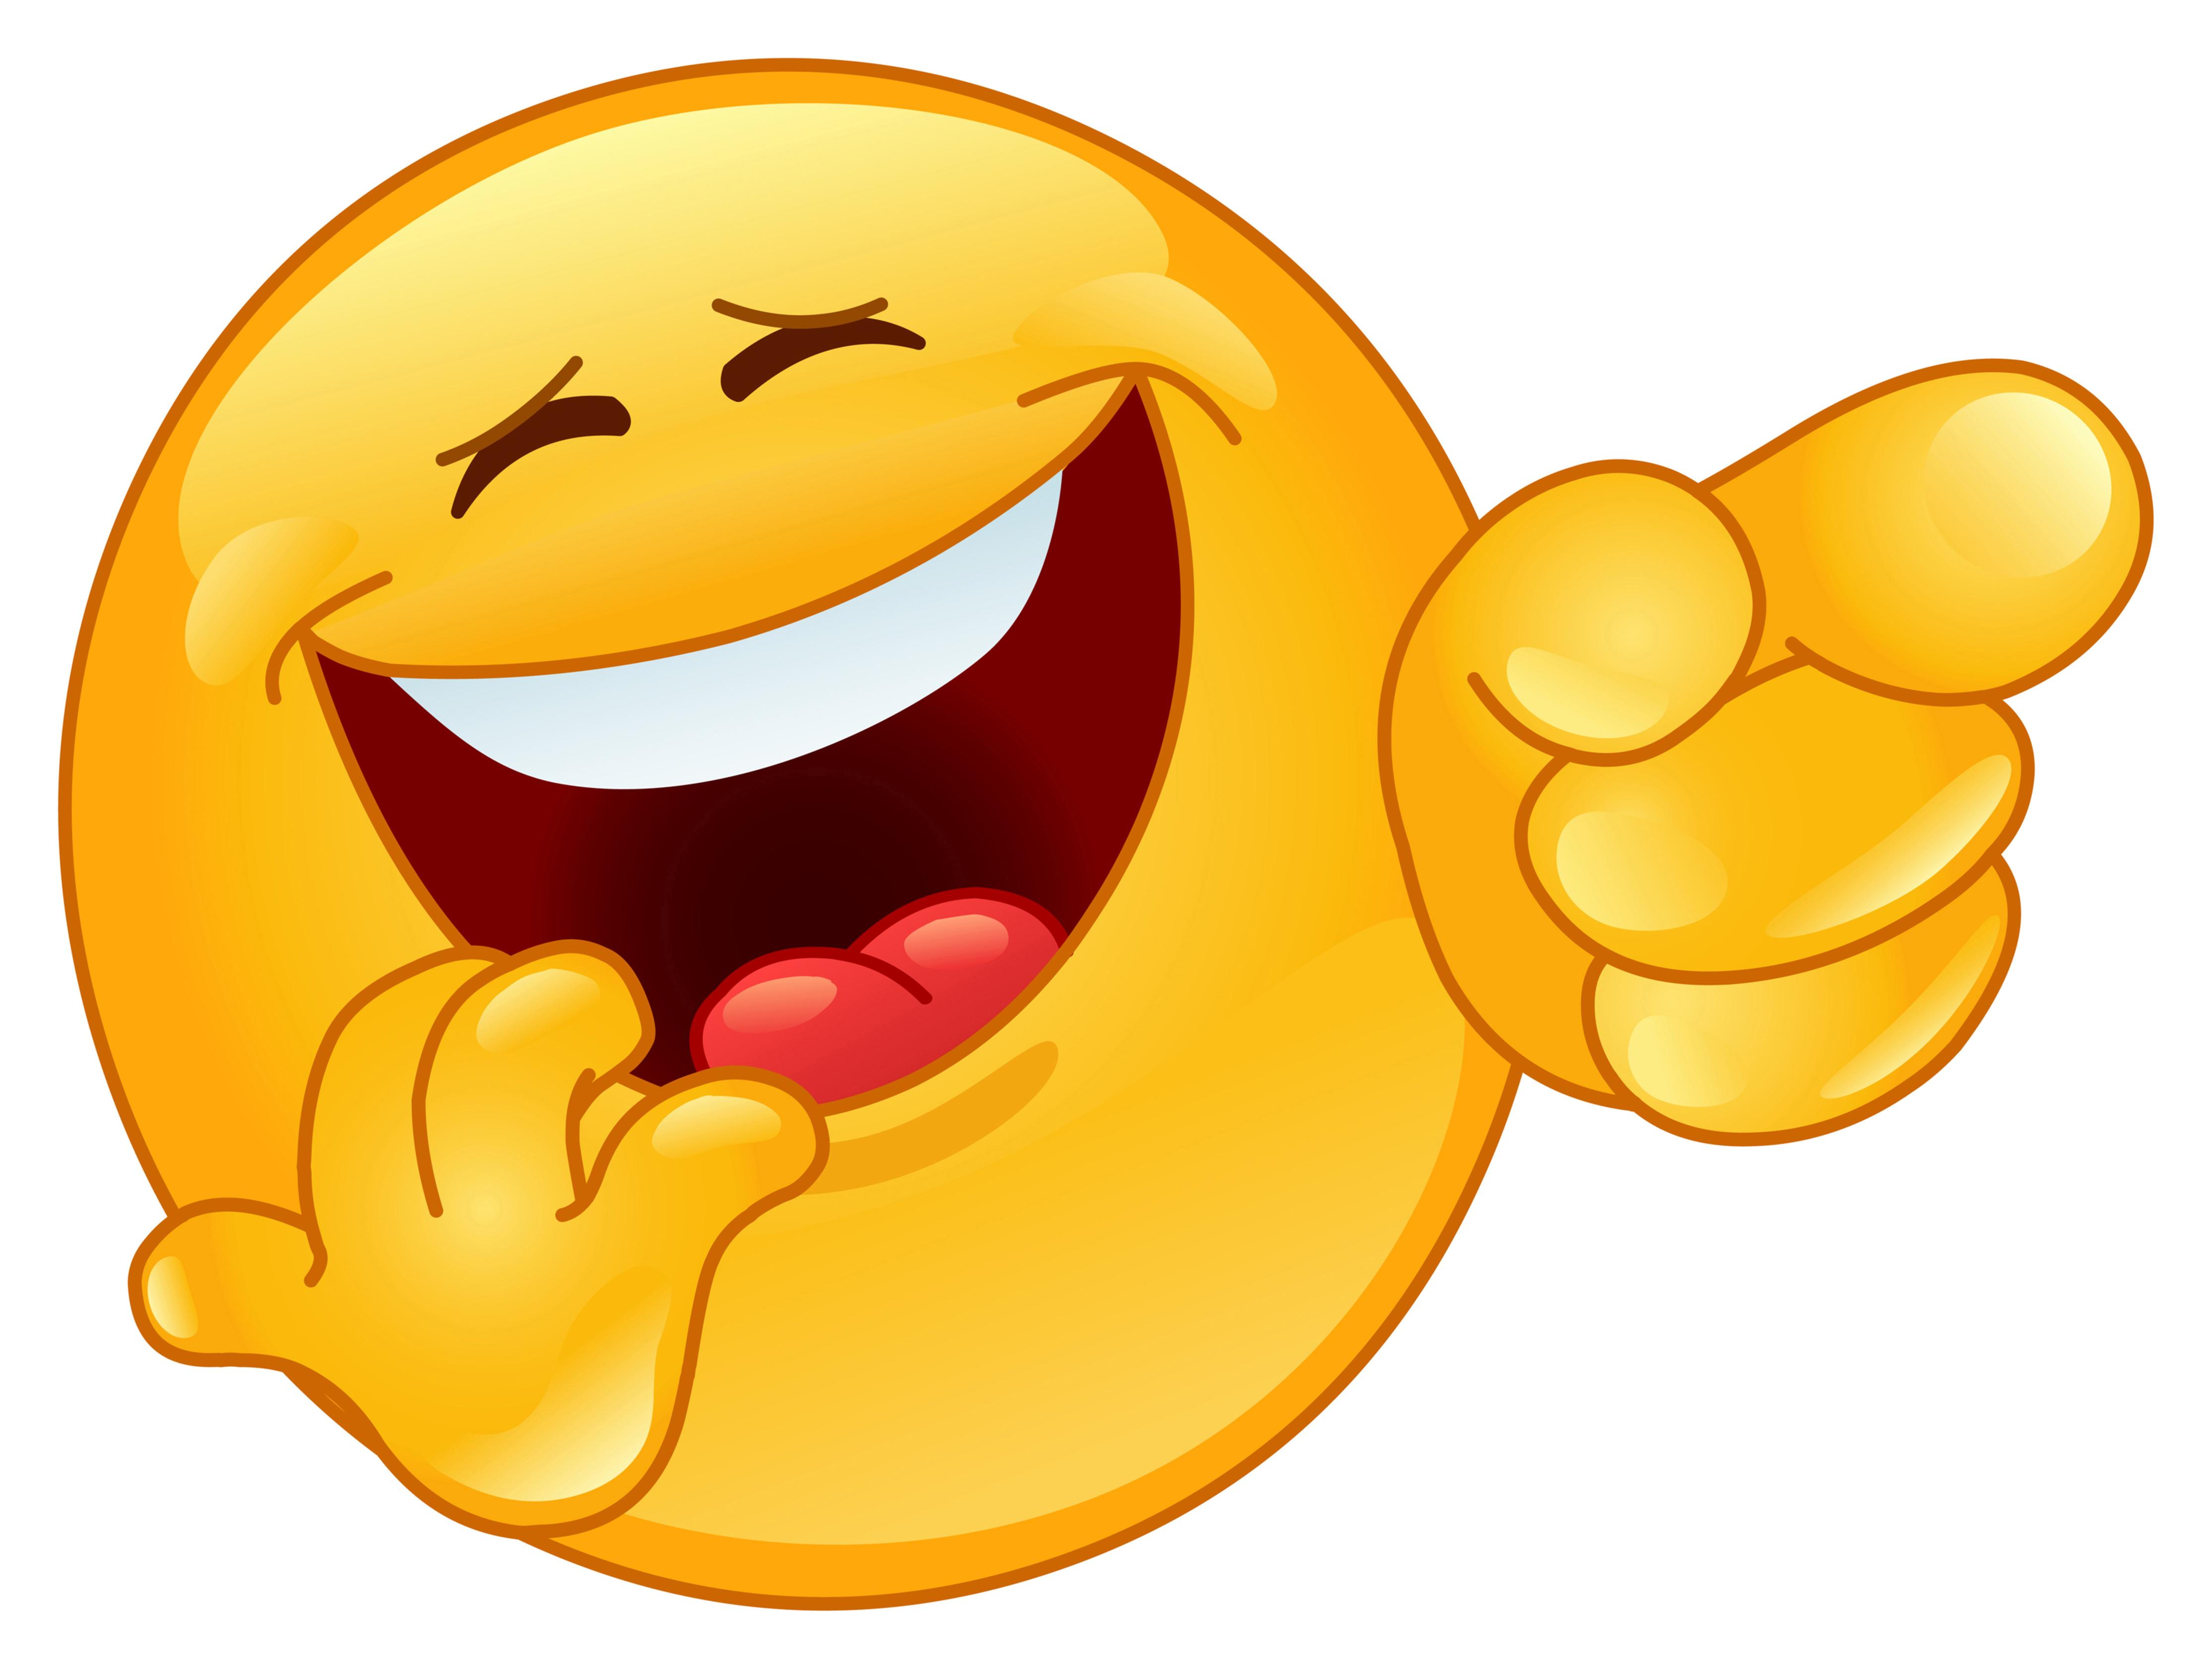 Image Gallery laughing cartoon - 1207.2KB